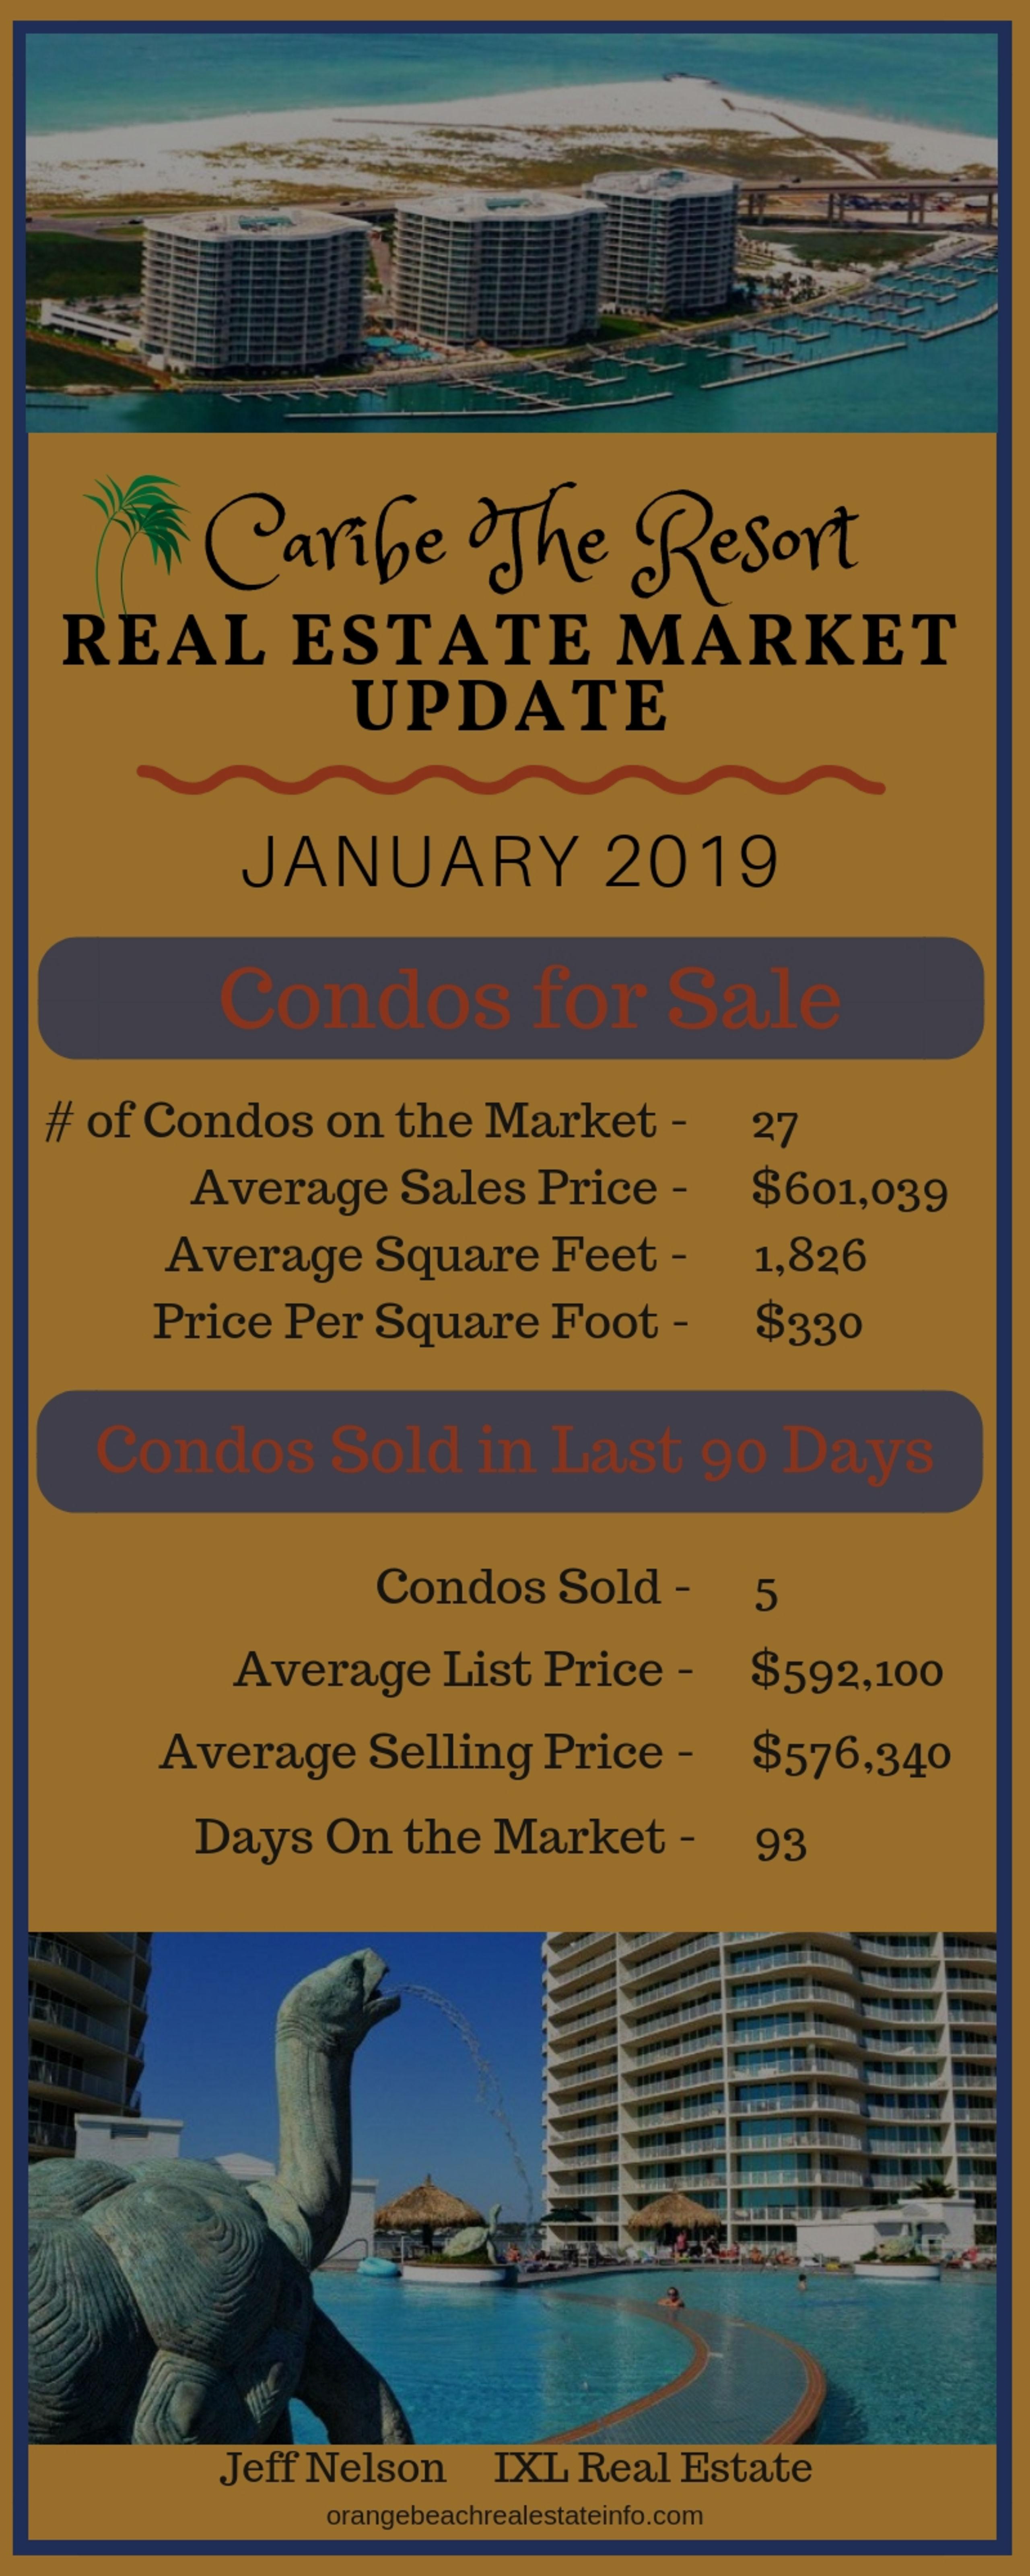 Caribe Real Estate Market Update – Jan 2019